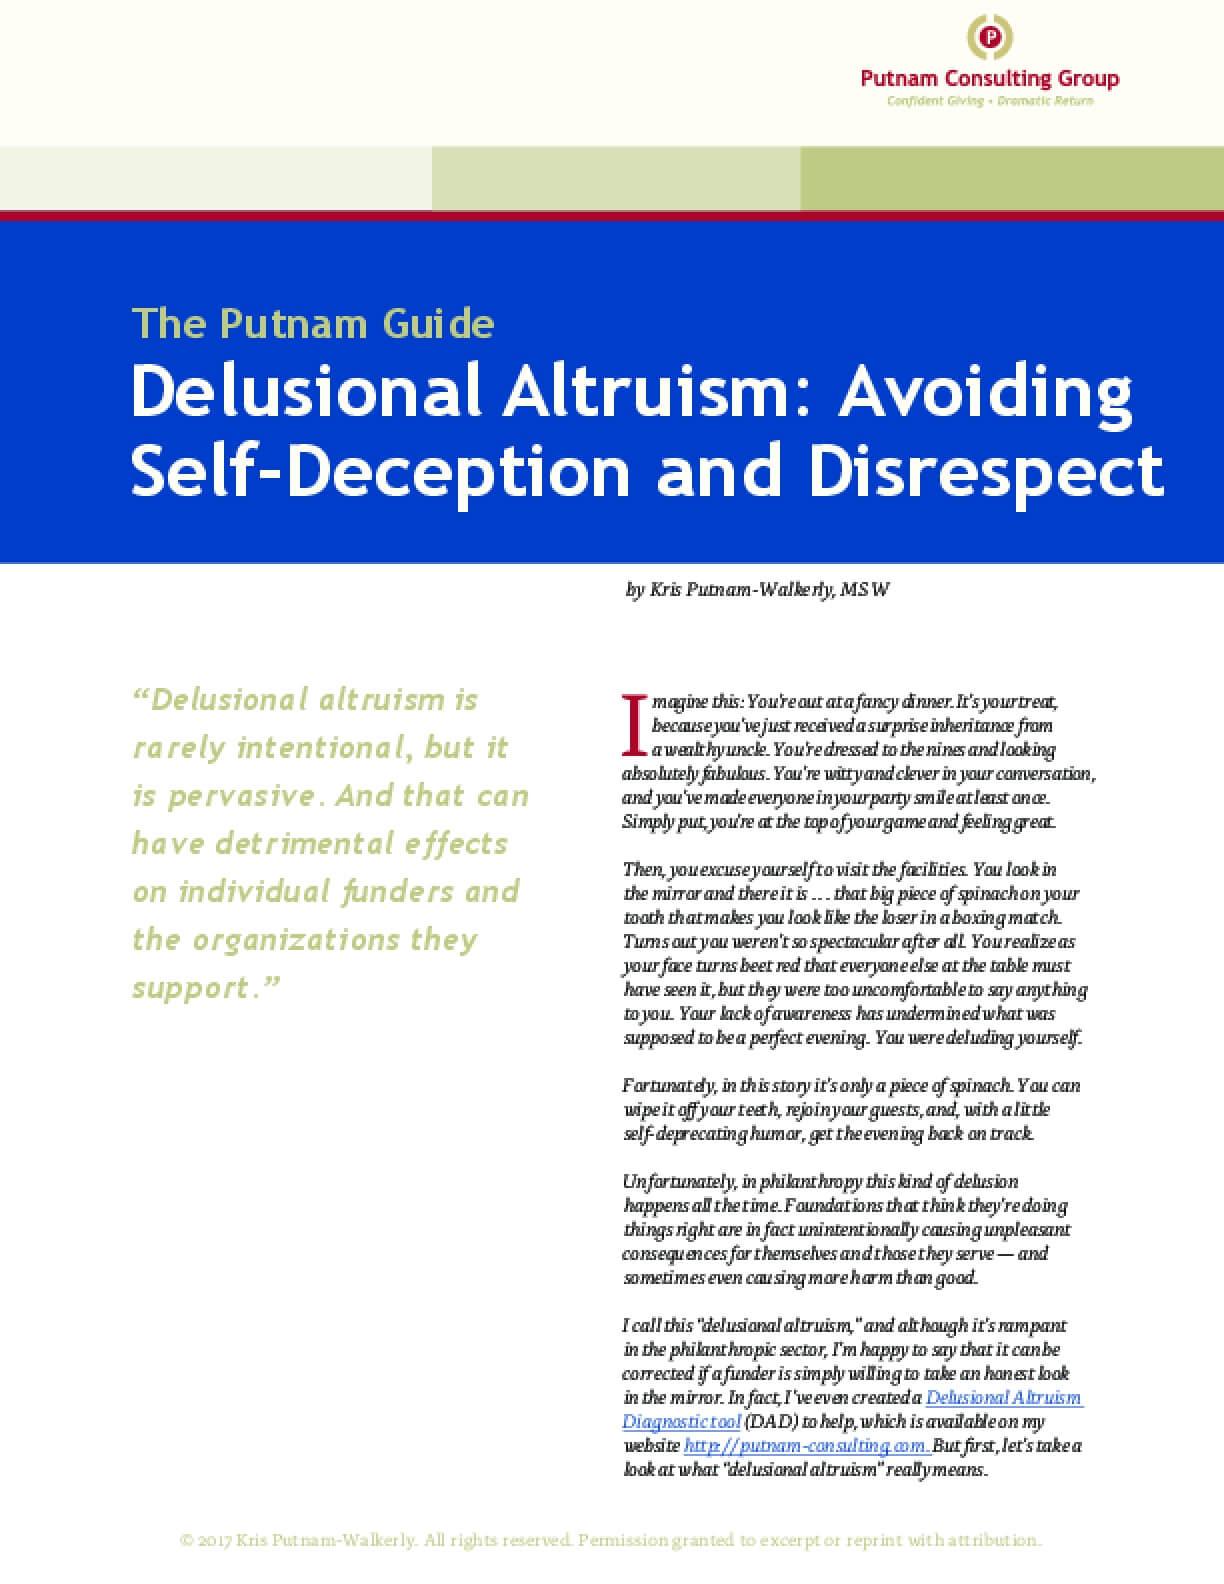 Delusional Altruism: Avoiding Self-Deception and Disrespect